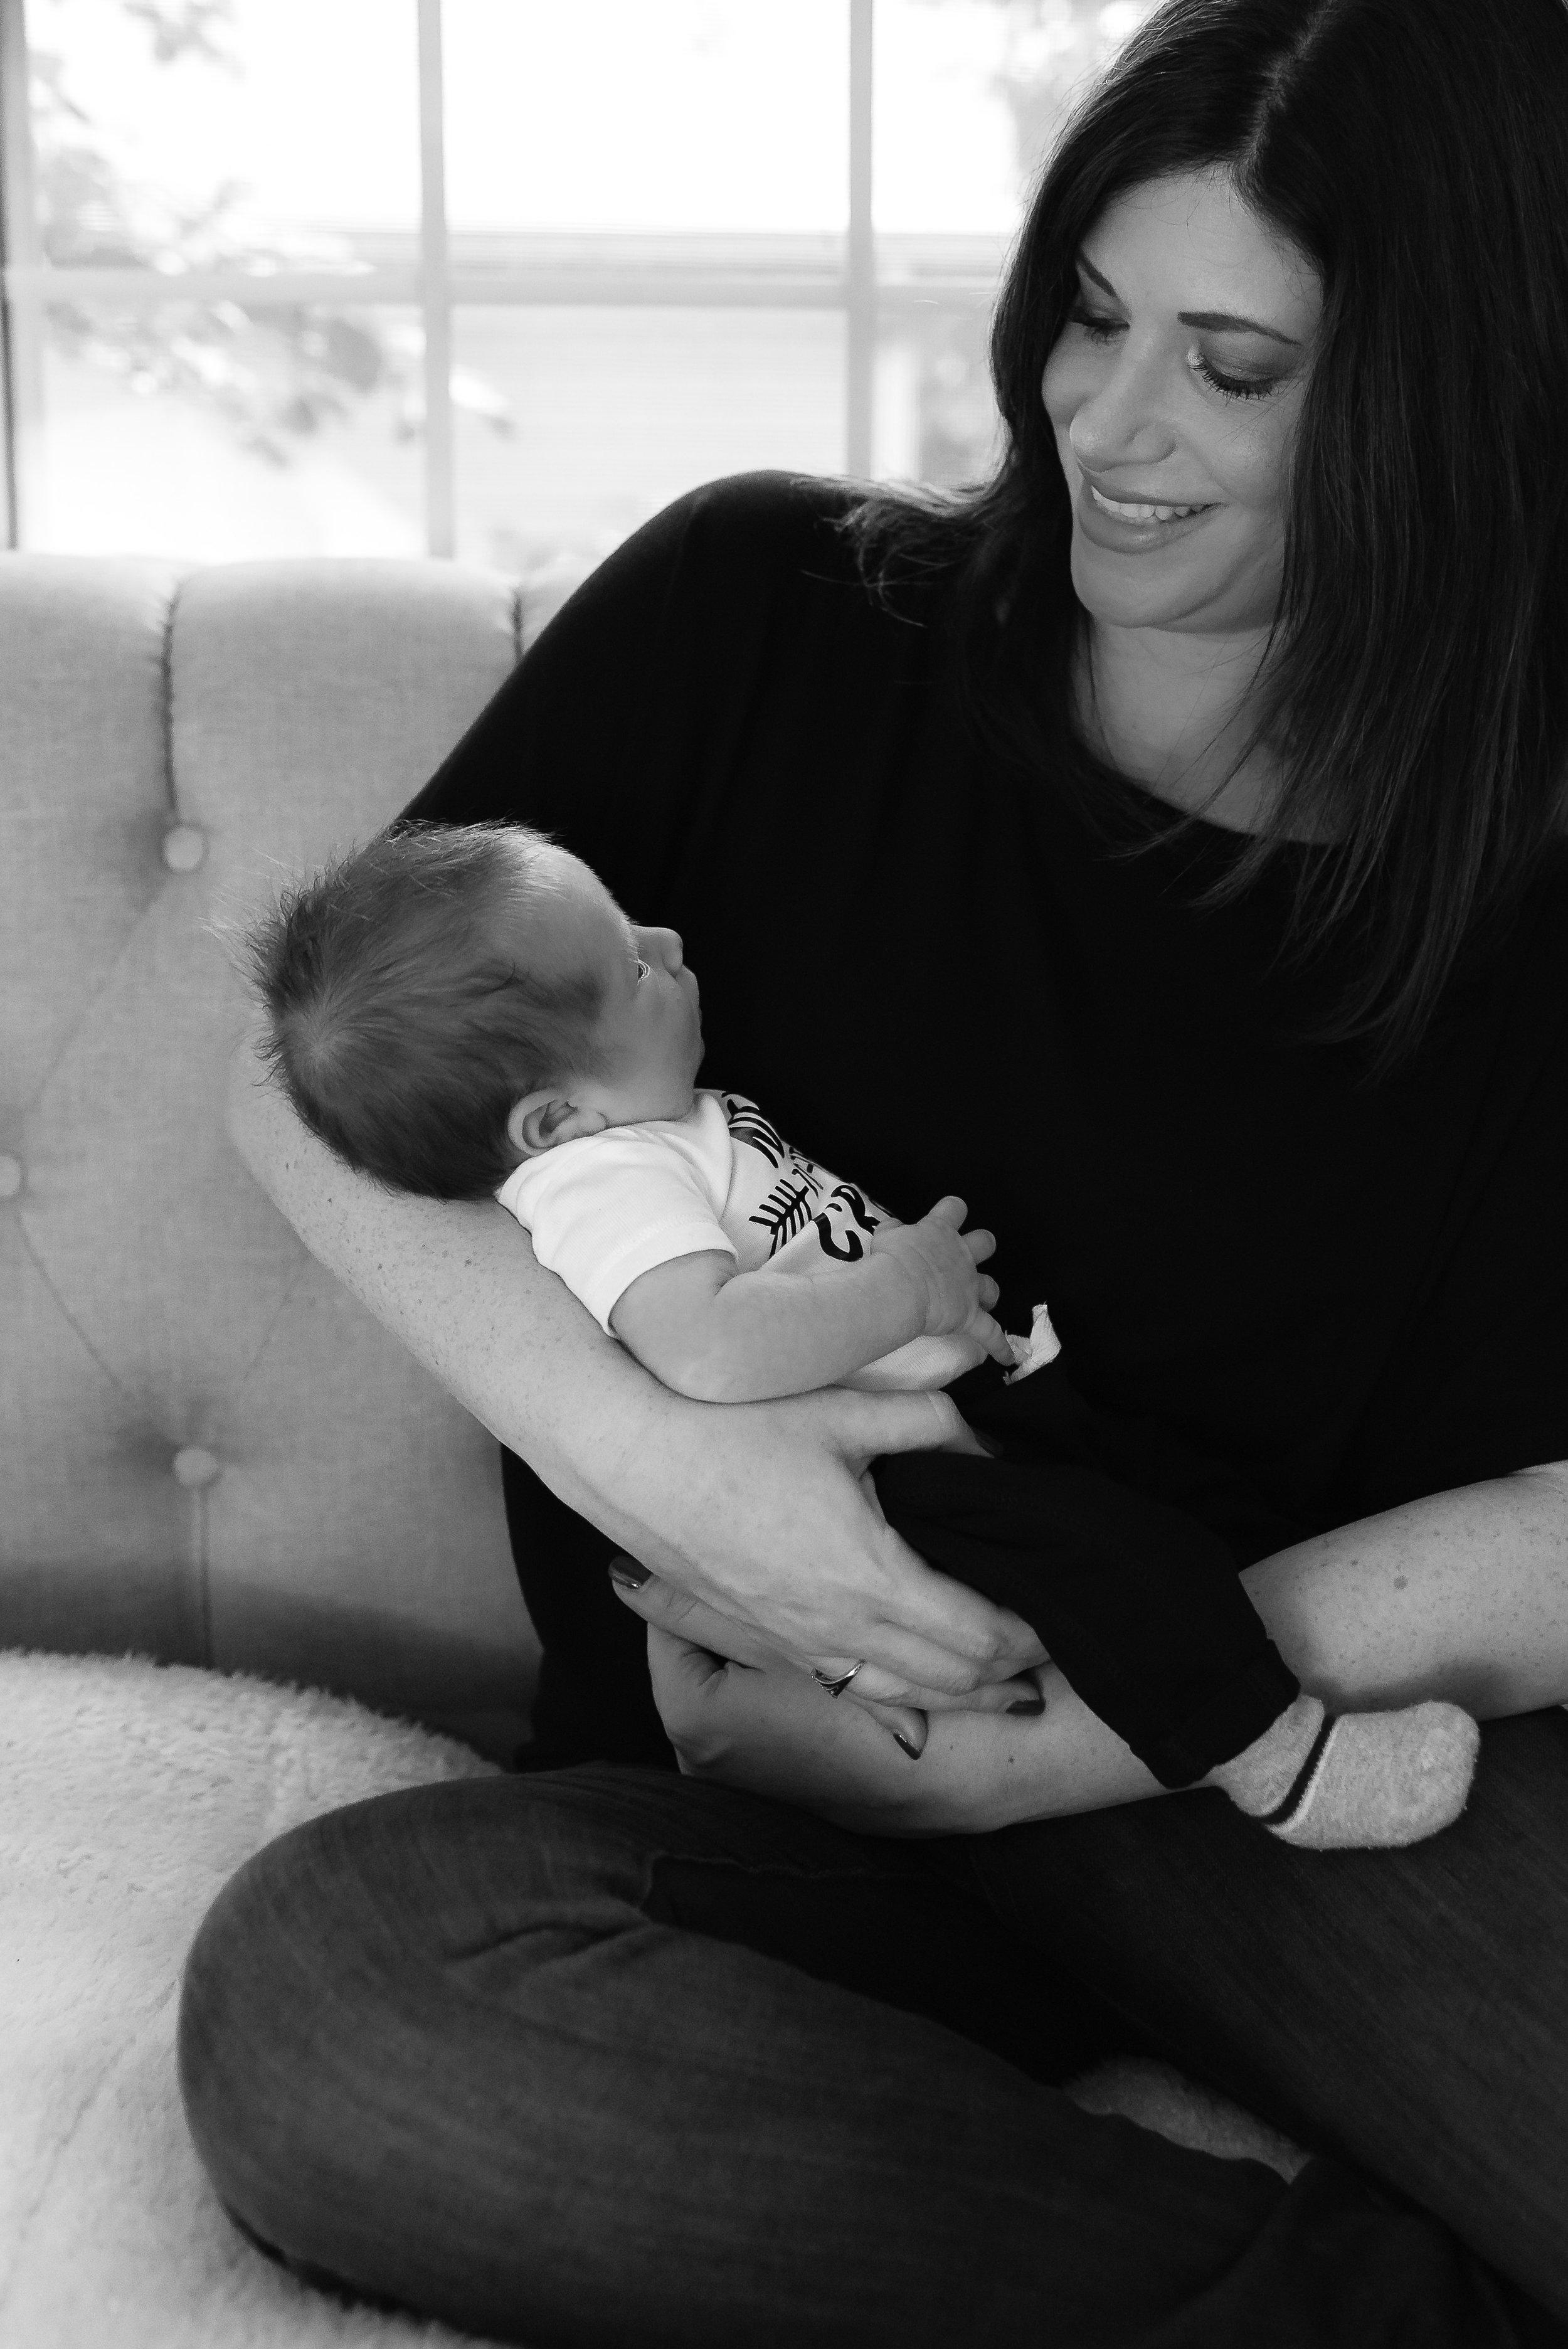 Erin-Fabio-Photography-Russell-Fischer_Newborns-104.jpg